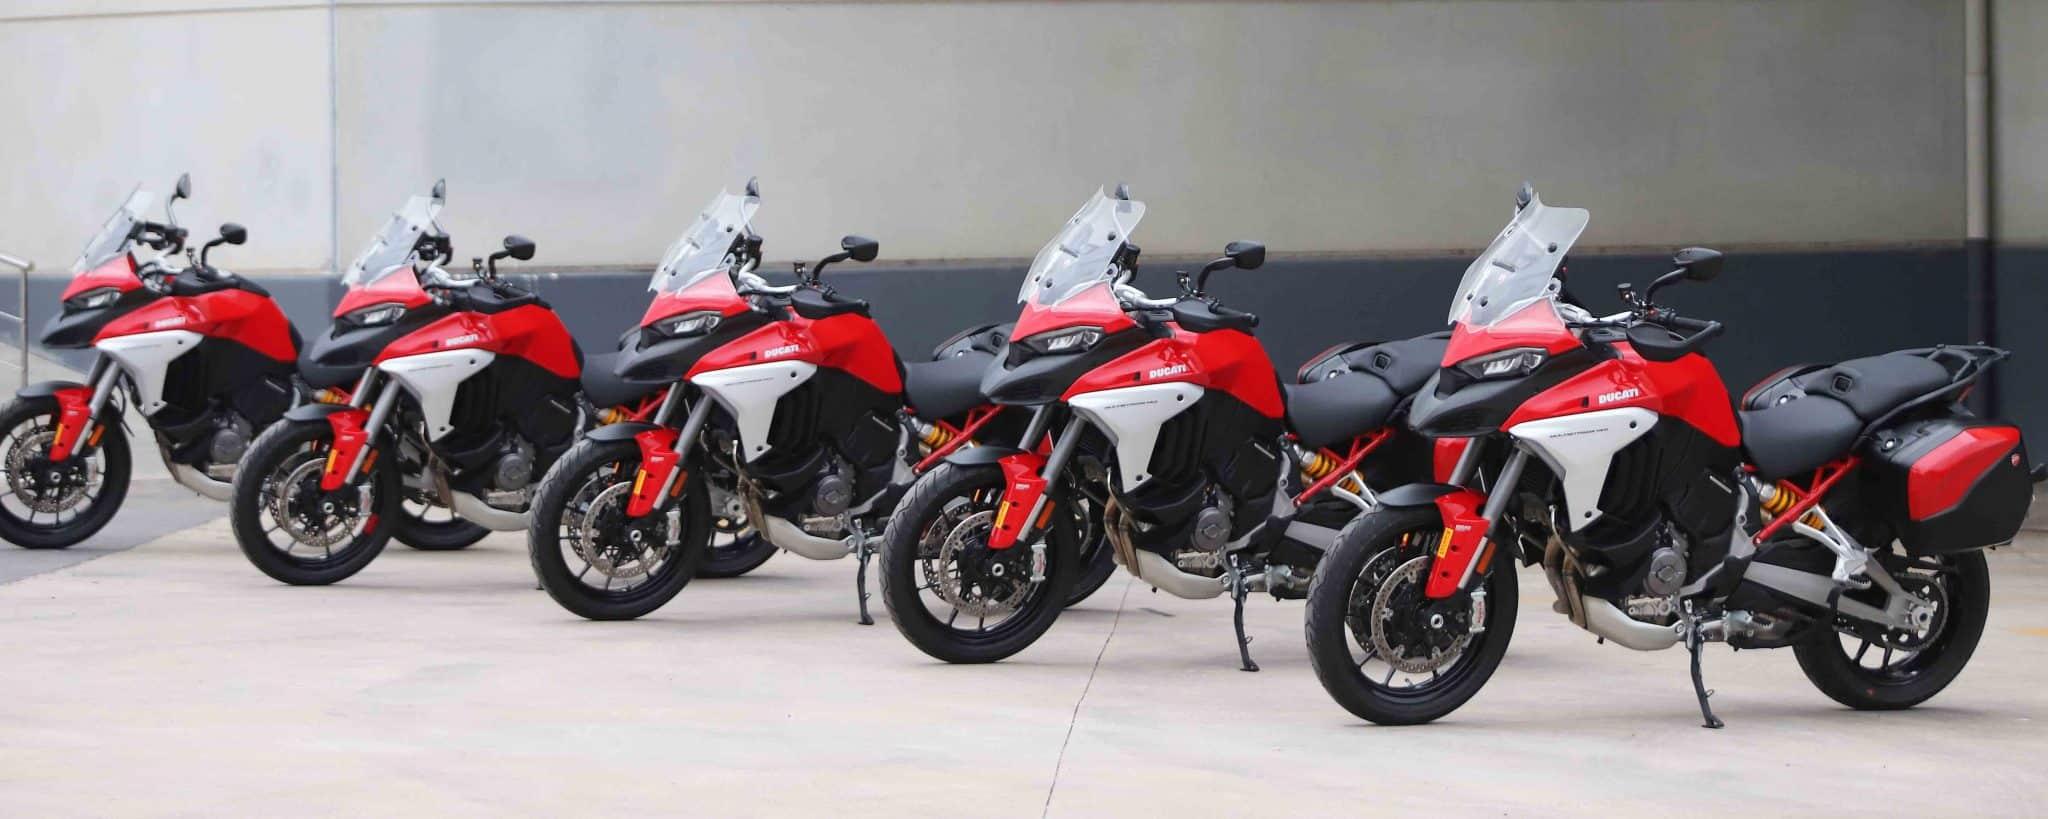 Prueba Ducati Multistrada V4. Portada